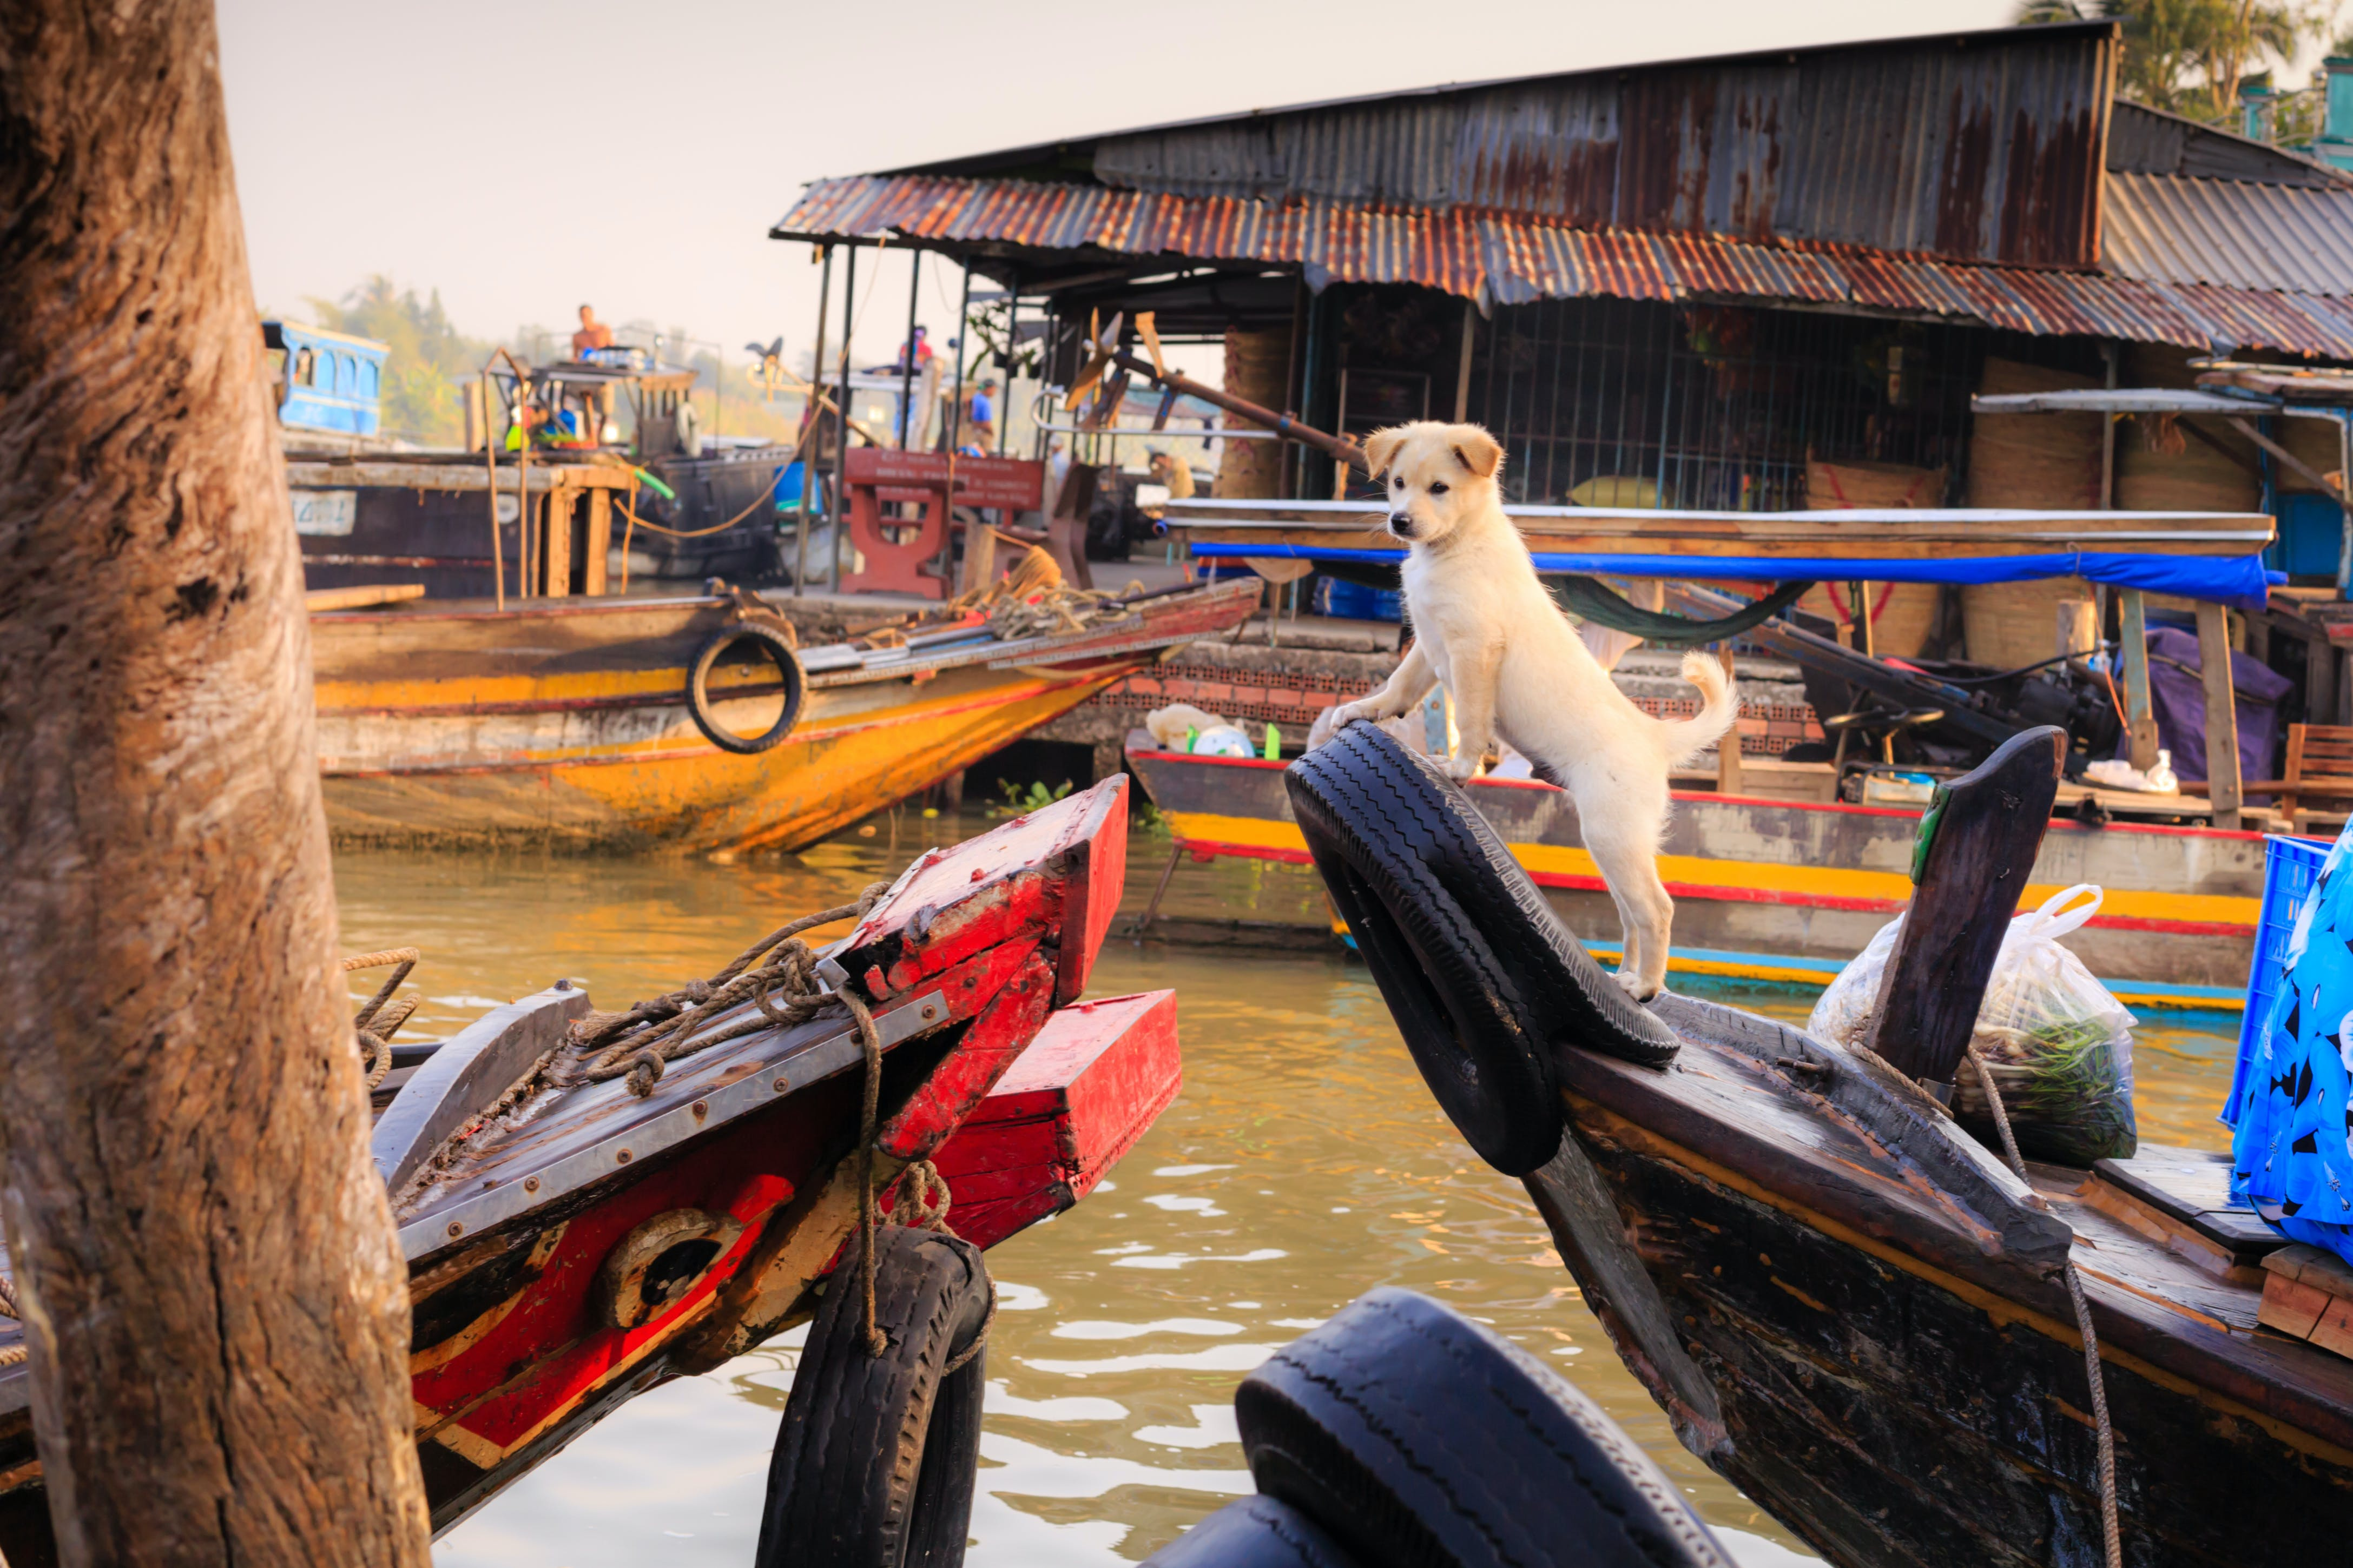 White Puppy on Boat